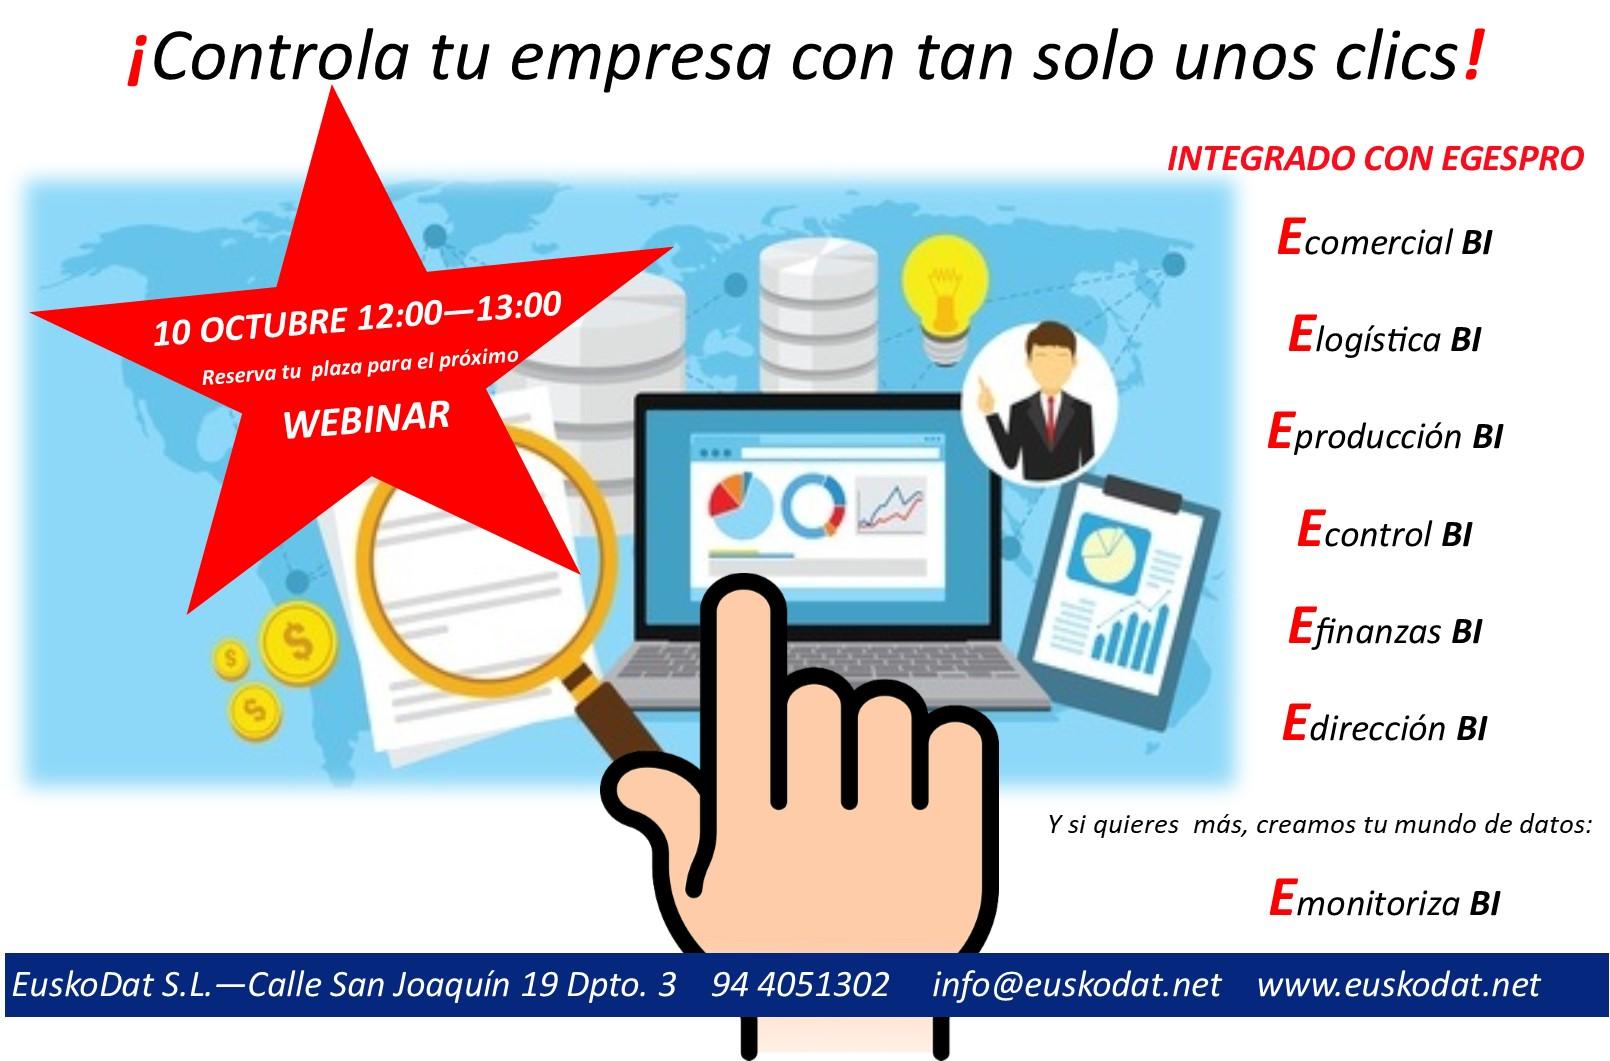 Inteligencia Empresarial Business Intelligence - ERP Egespro. EuskoDat